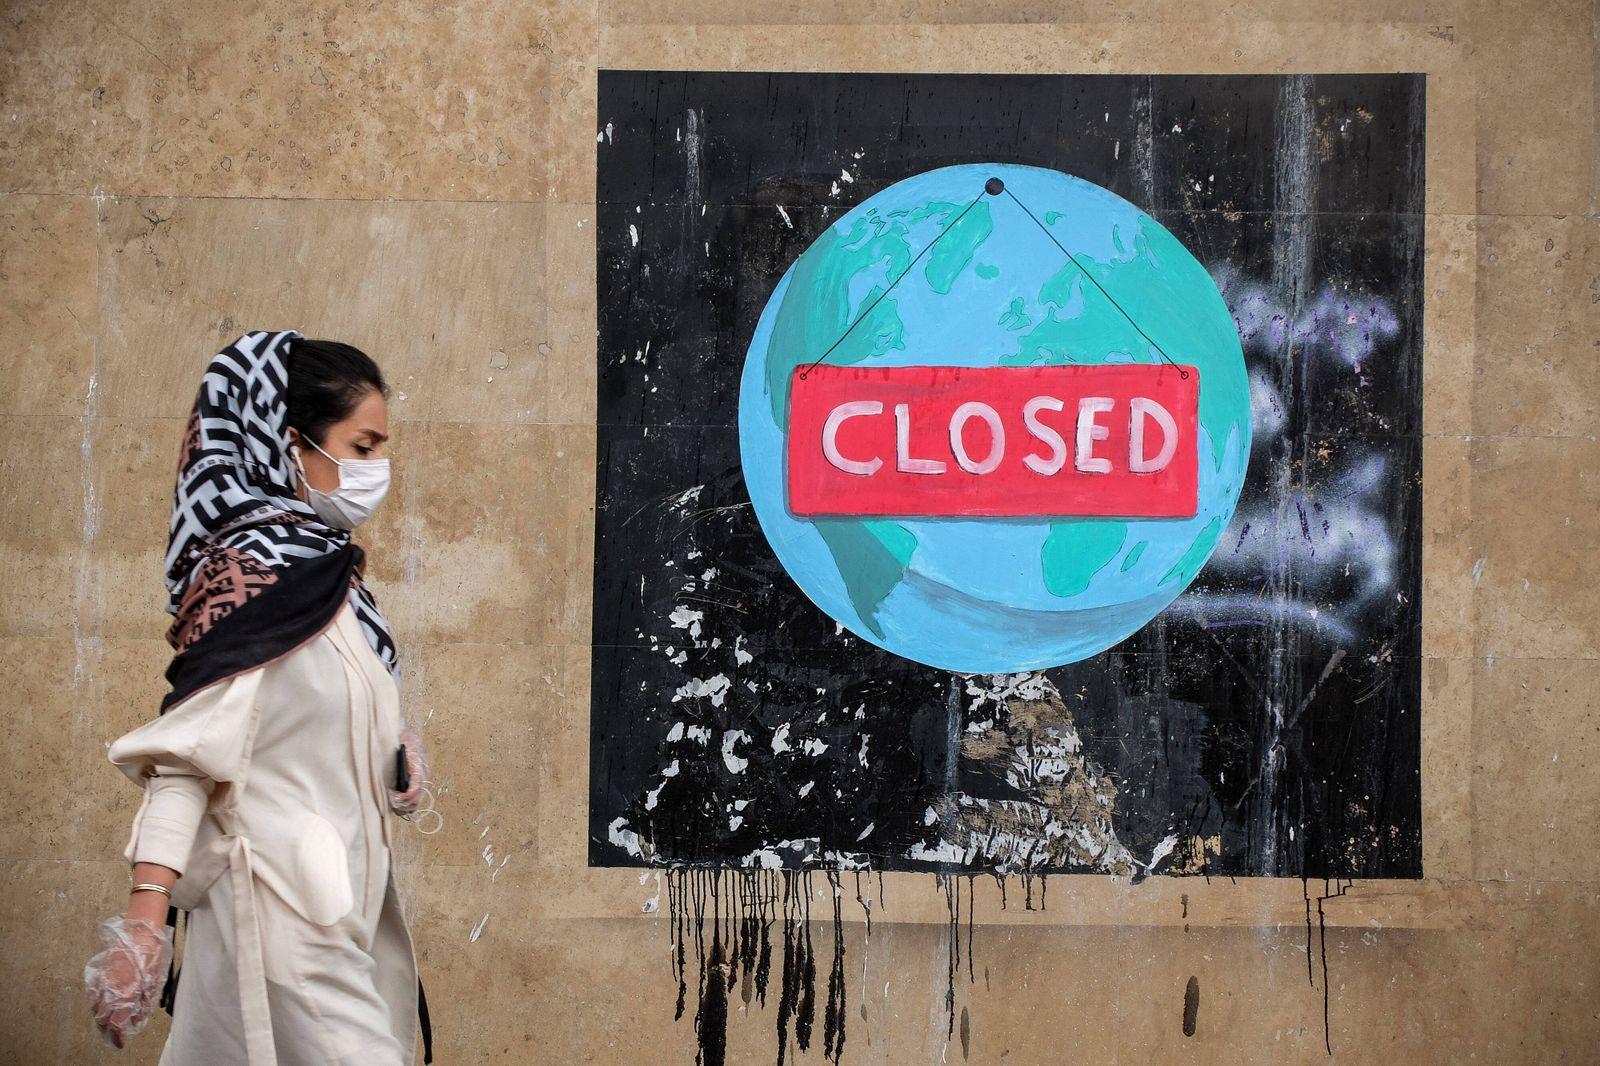 April 30, 2020, Tehran, Iran: A graffiti is seen in downtown Tehran, following the new coronavirus disease (COVID-19) o